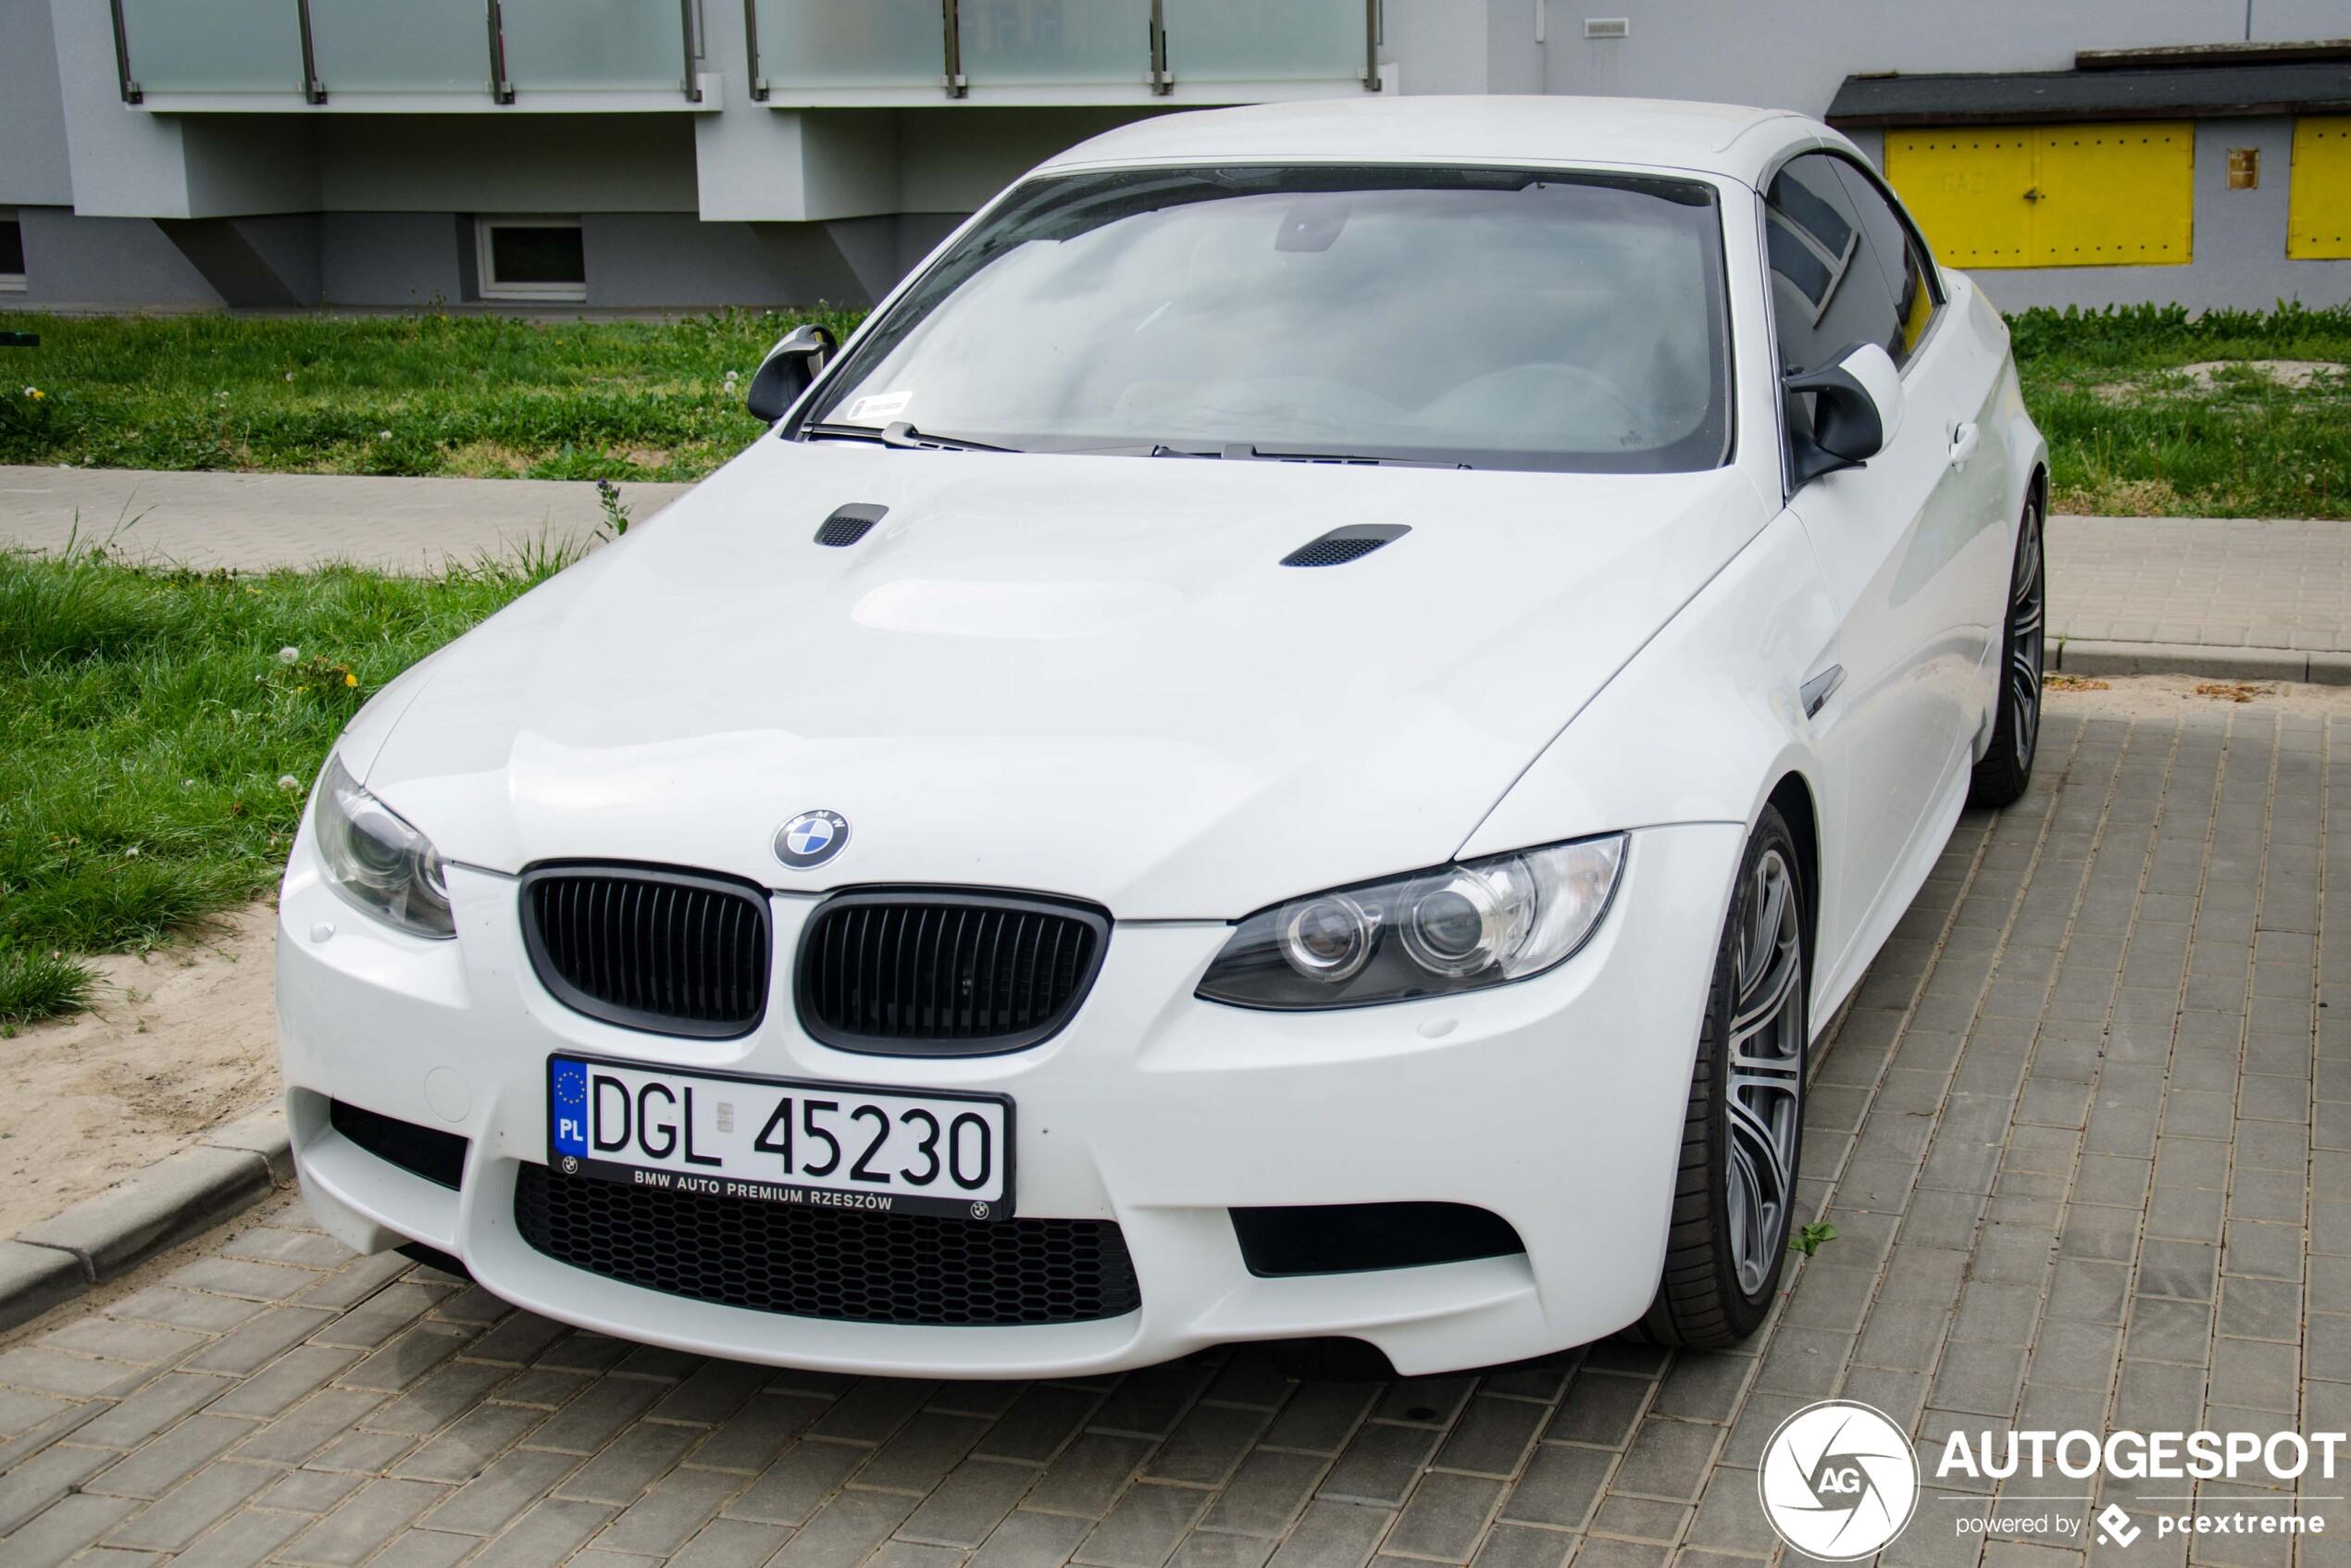 BMW M3 E93 Cabriolet - 12 februari 2020 - Autogespot